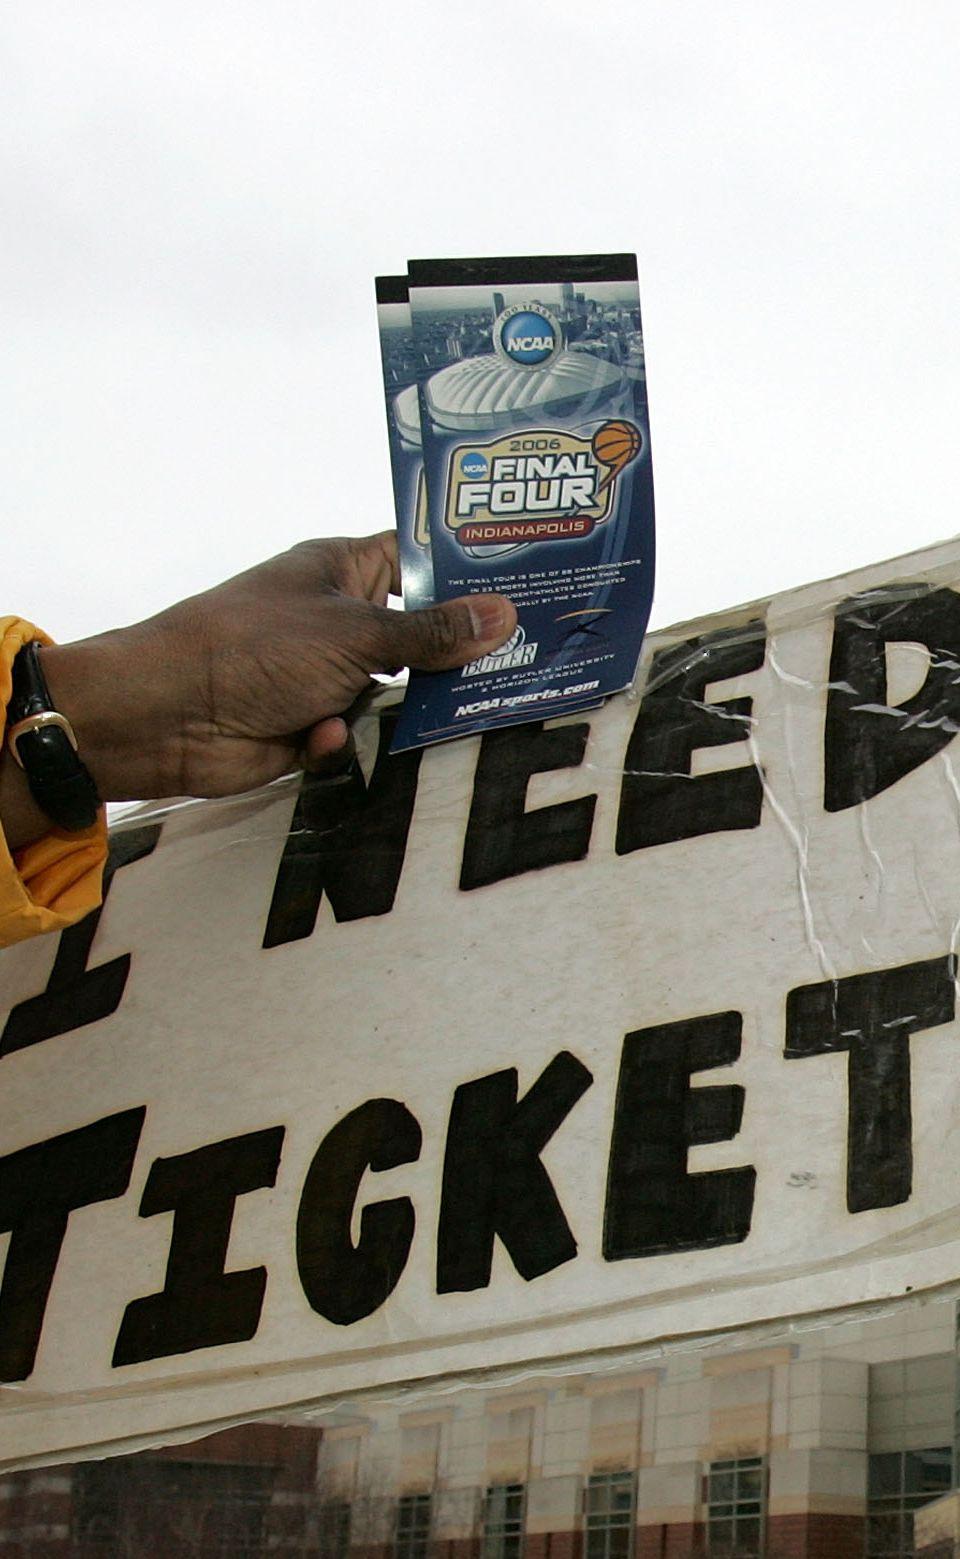 getty-i-need-tickets_1500_57298470.jpg